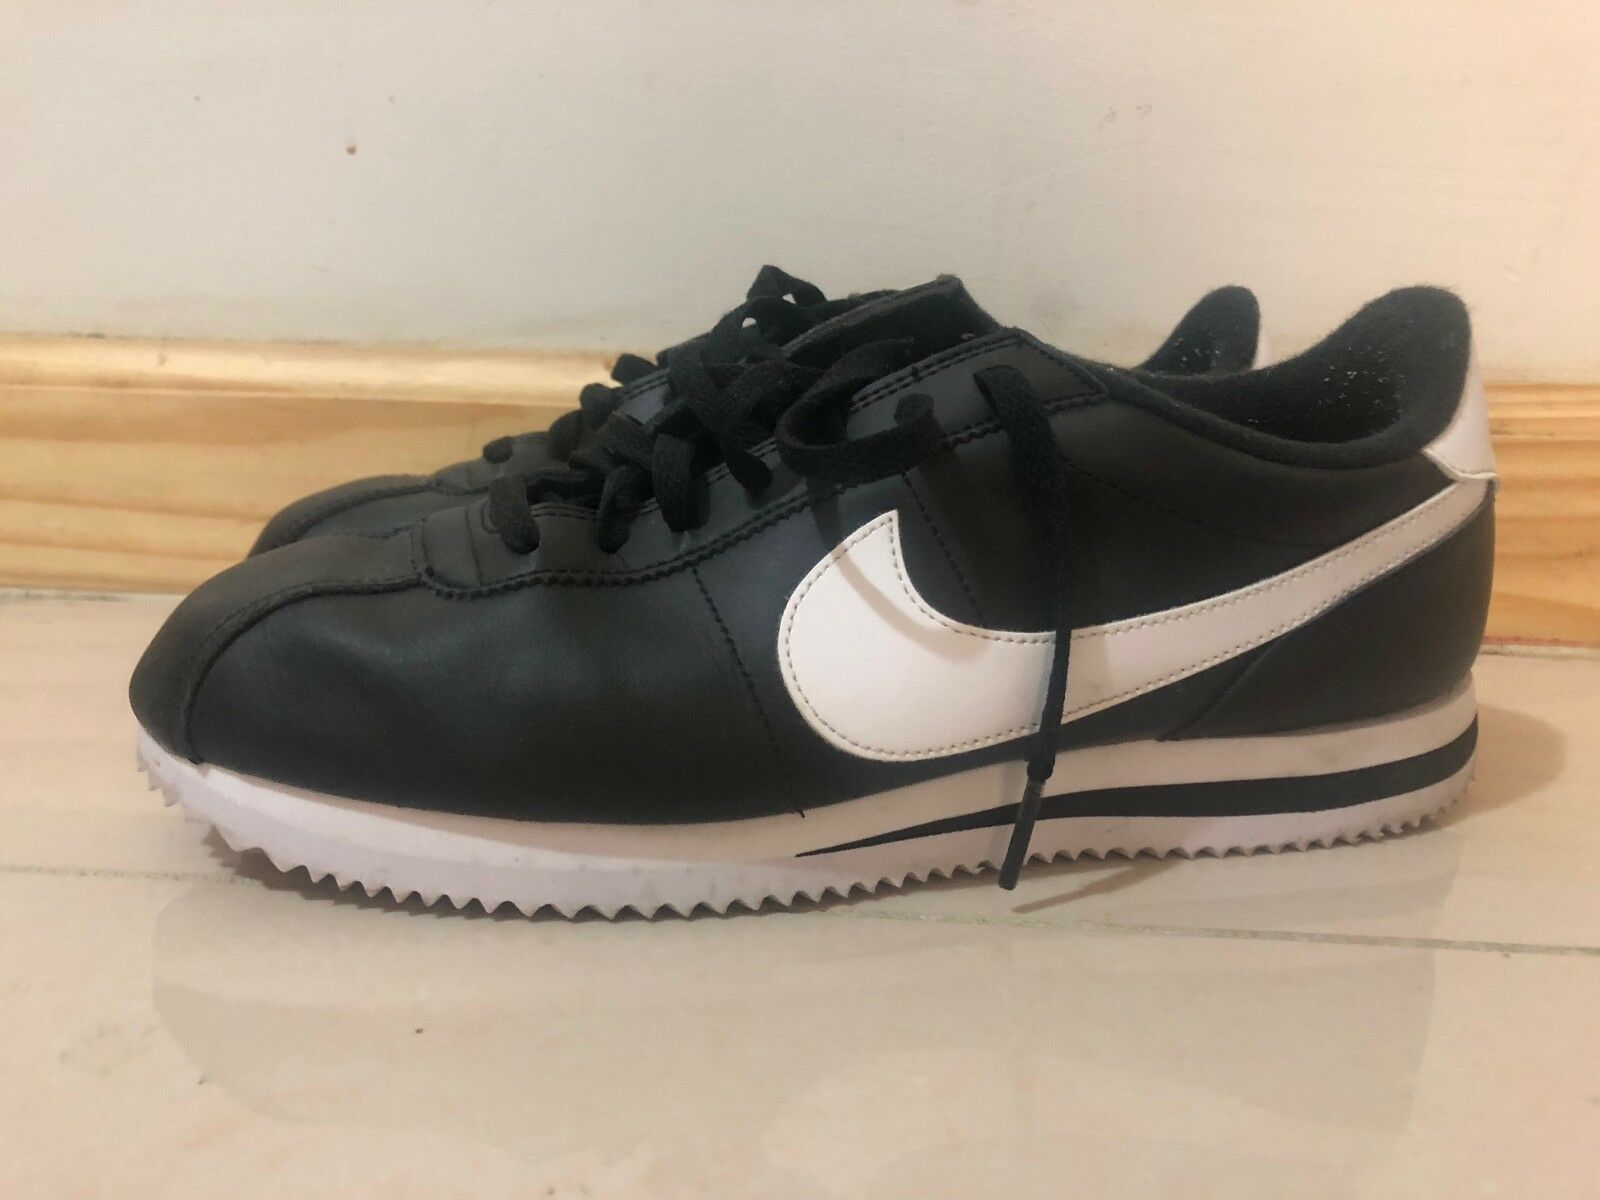 Nike Cortez Size 9.5 black and white brand new